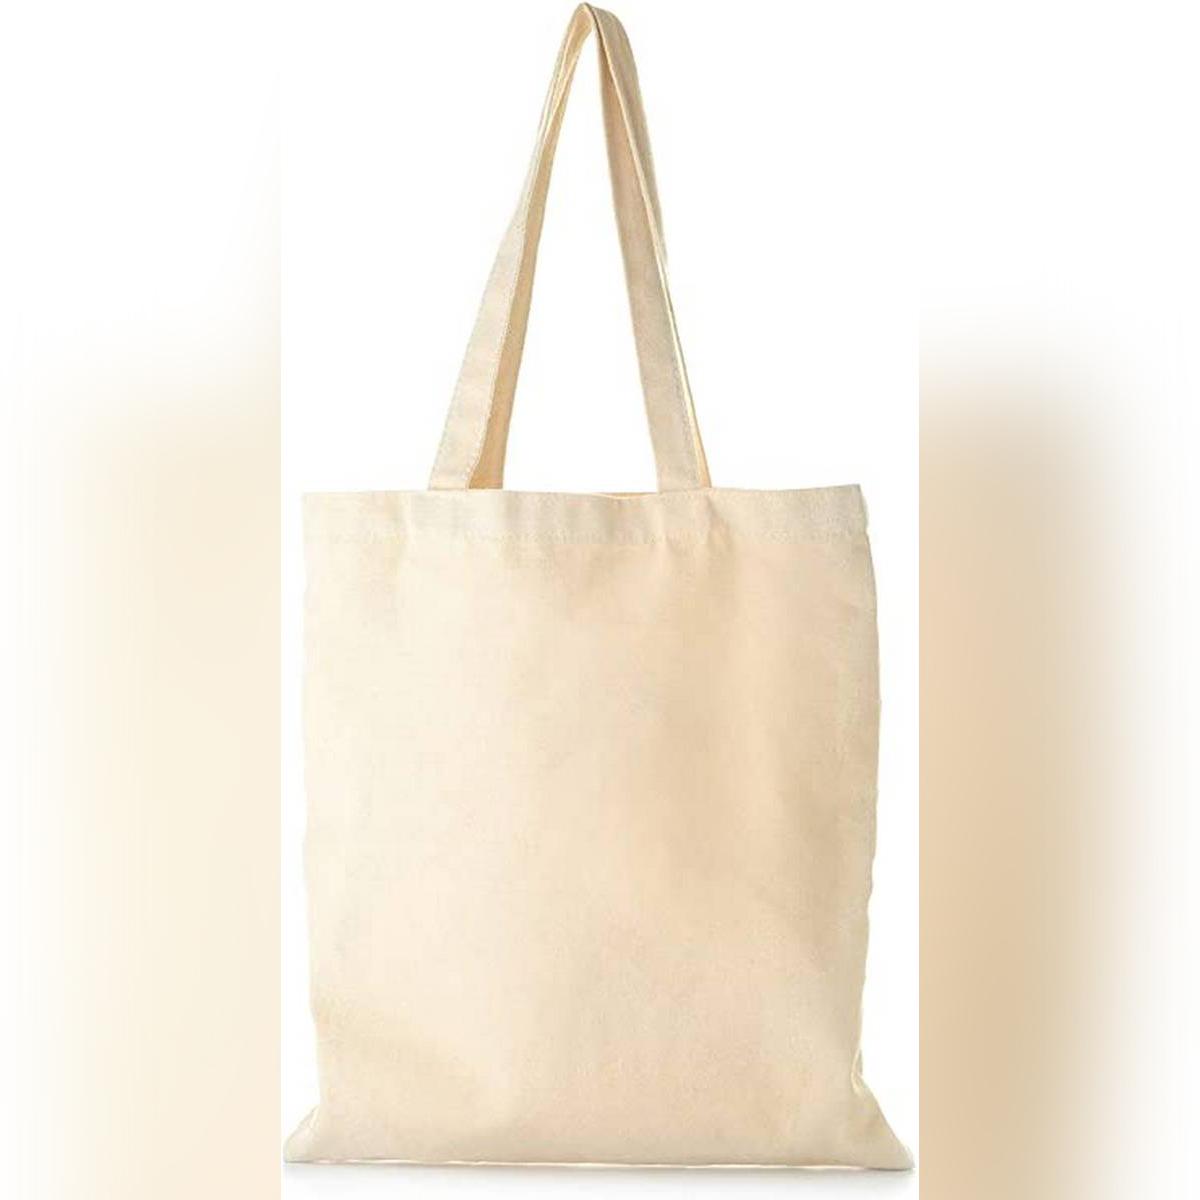 Tote bag - Small Beige